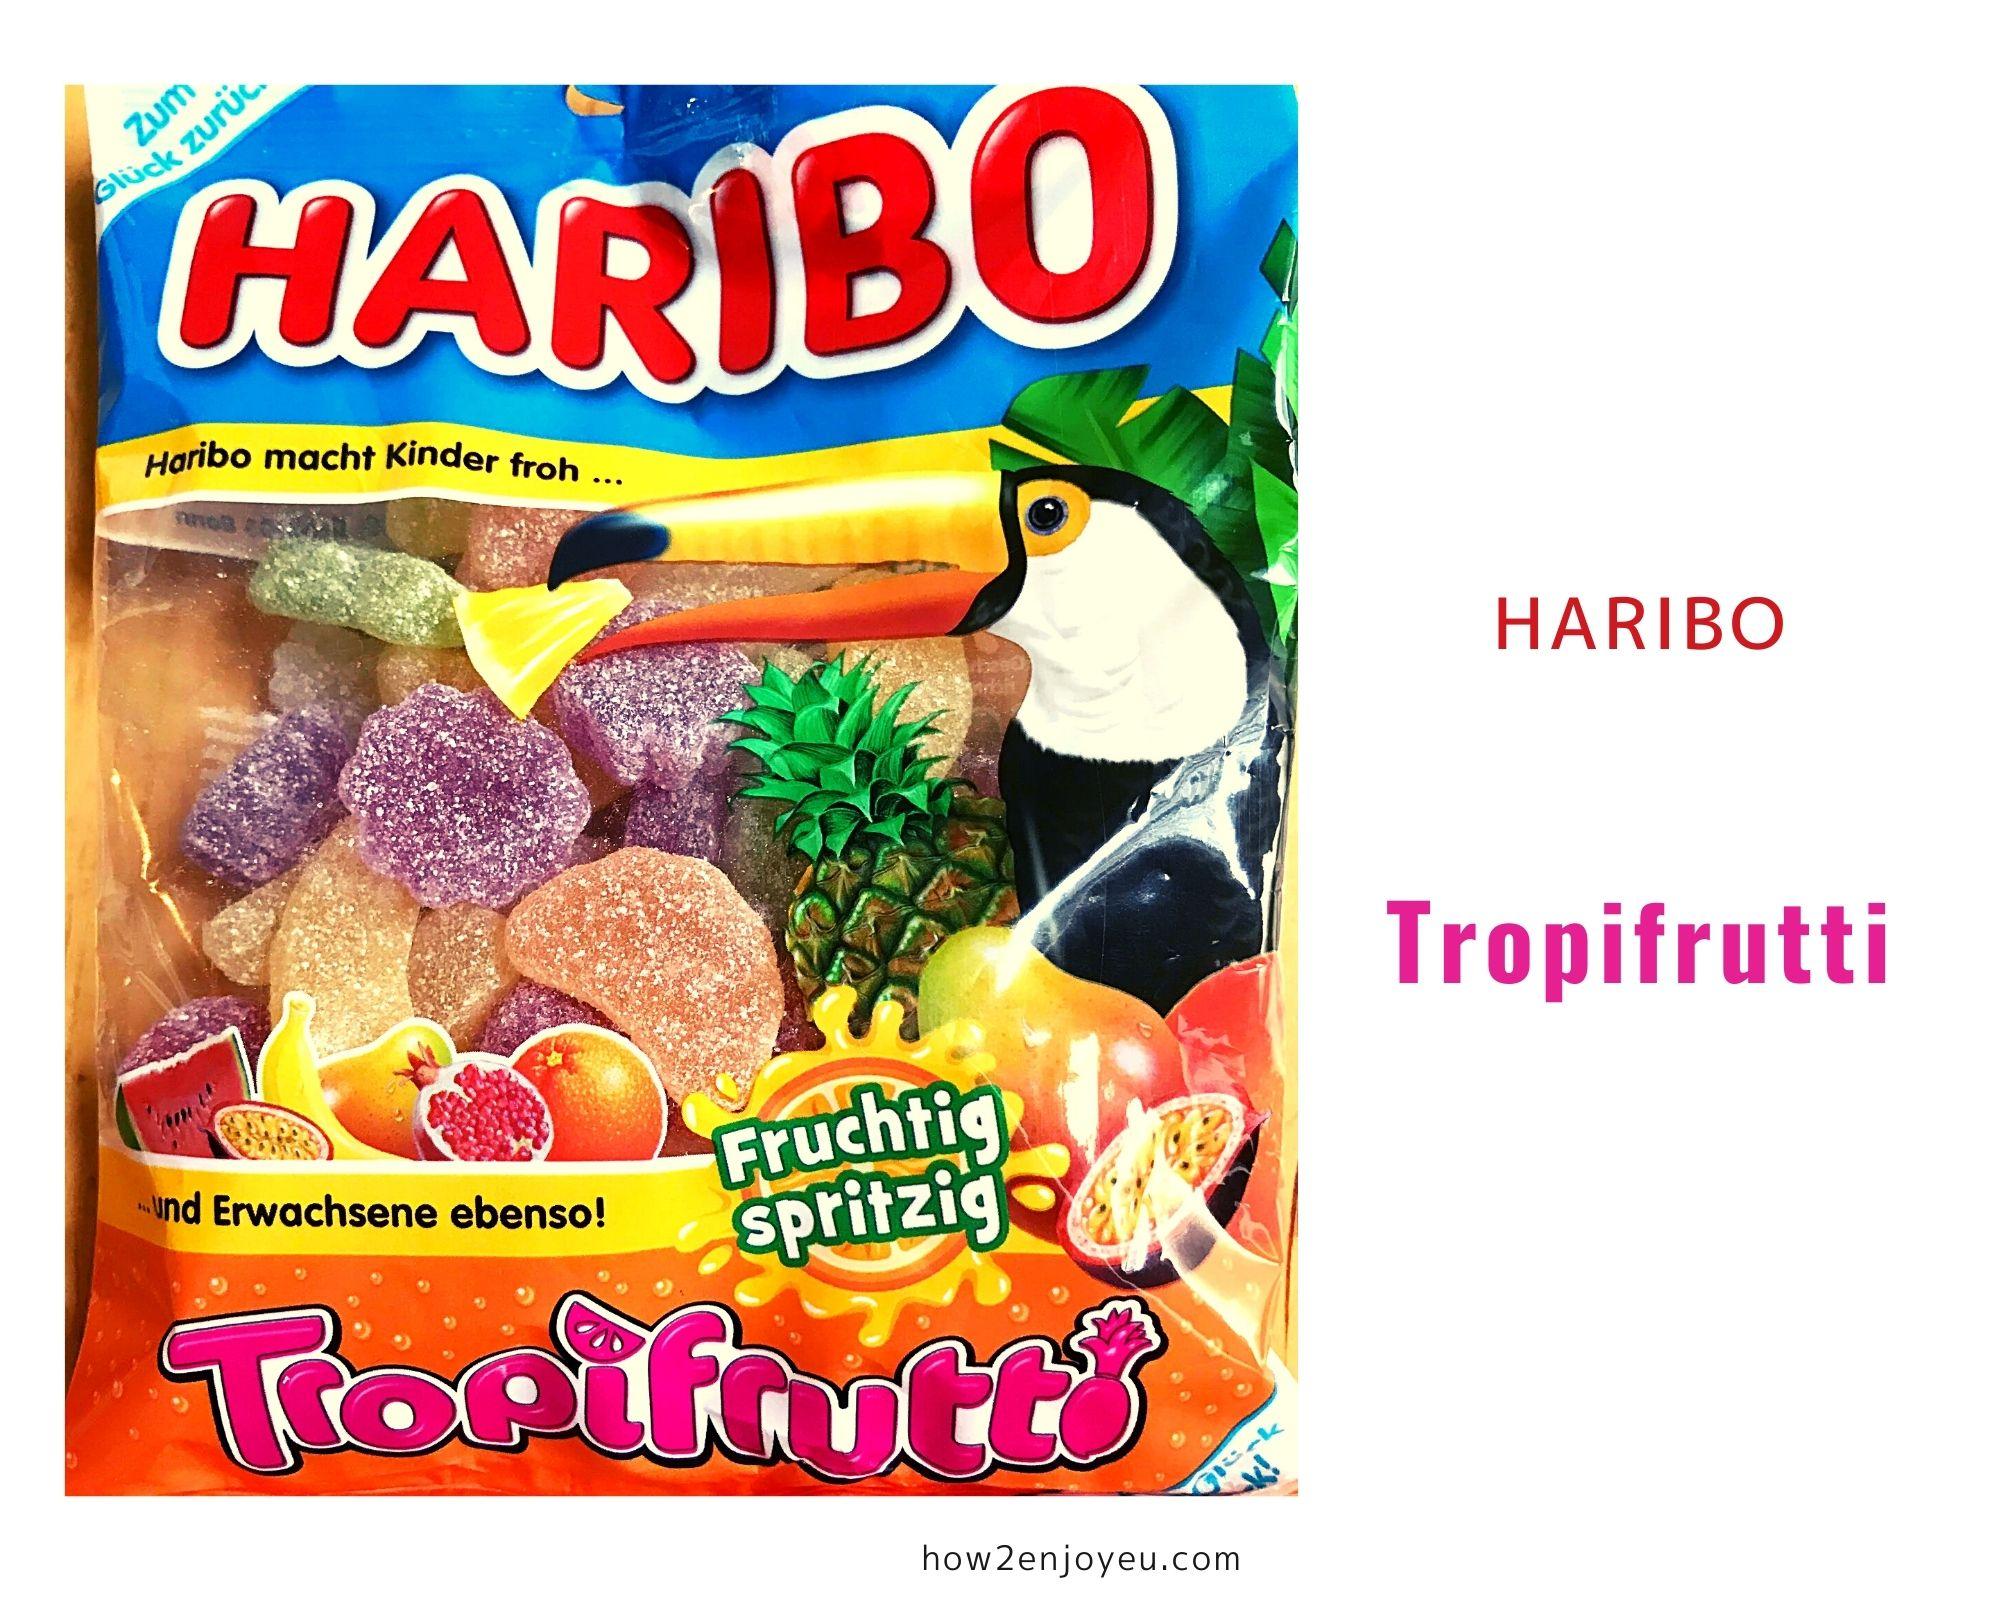 Read more about the article ハリボー の定番、トロピカルフルーツ・グミの新バージョン?【Tropifrutti Haribo】